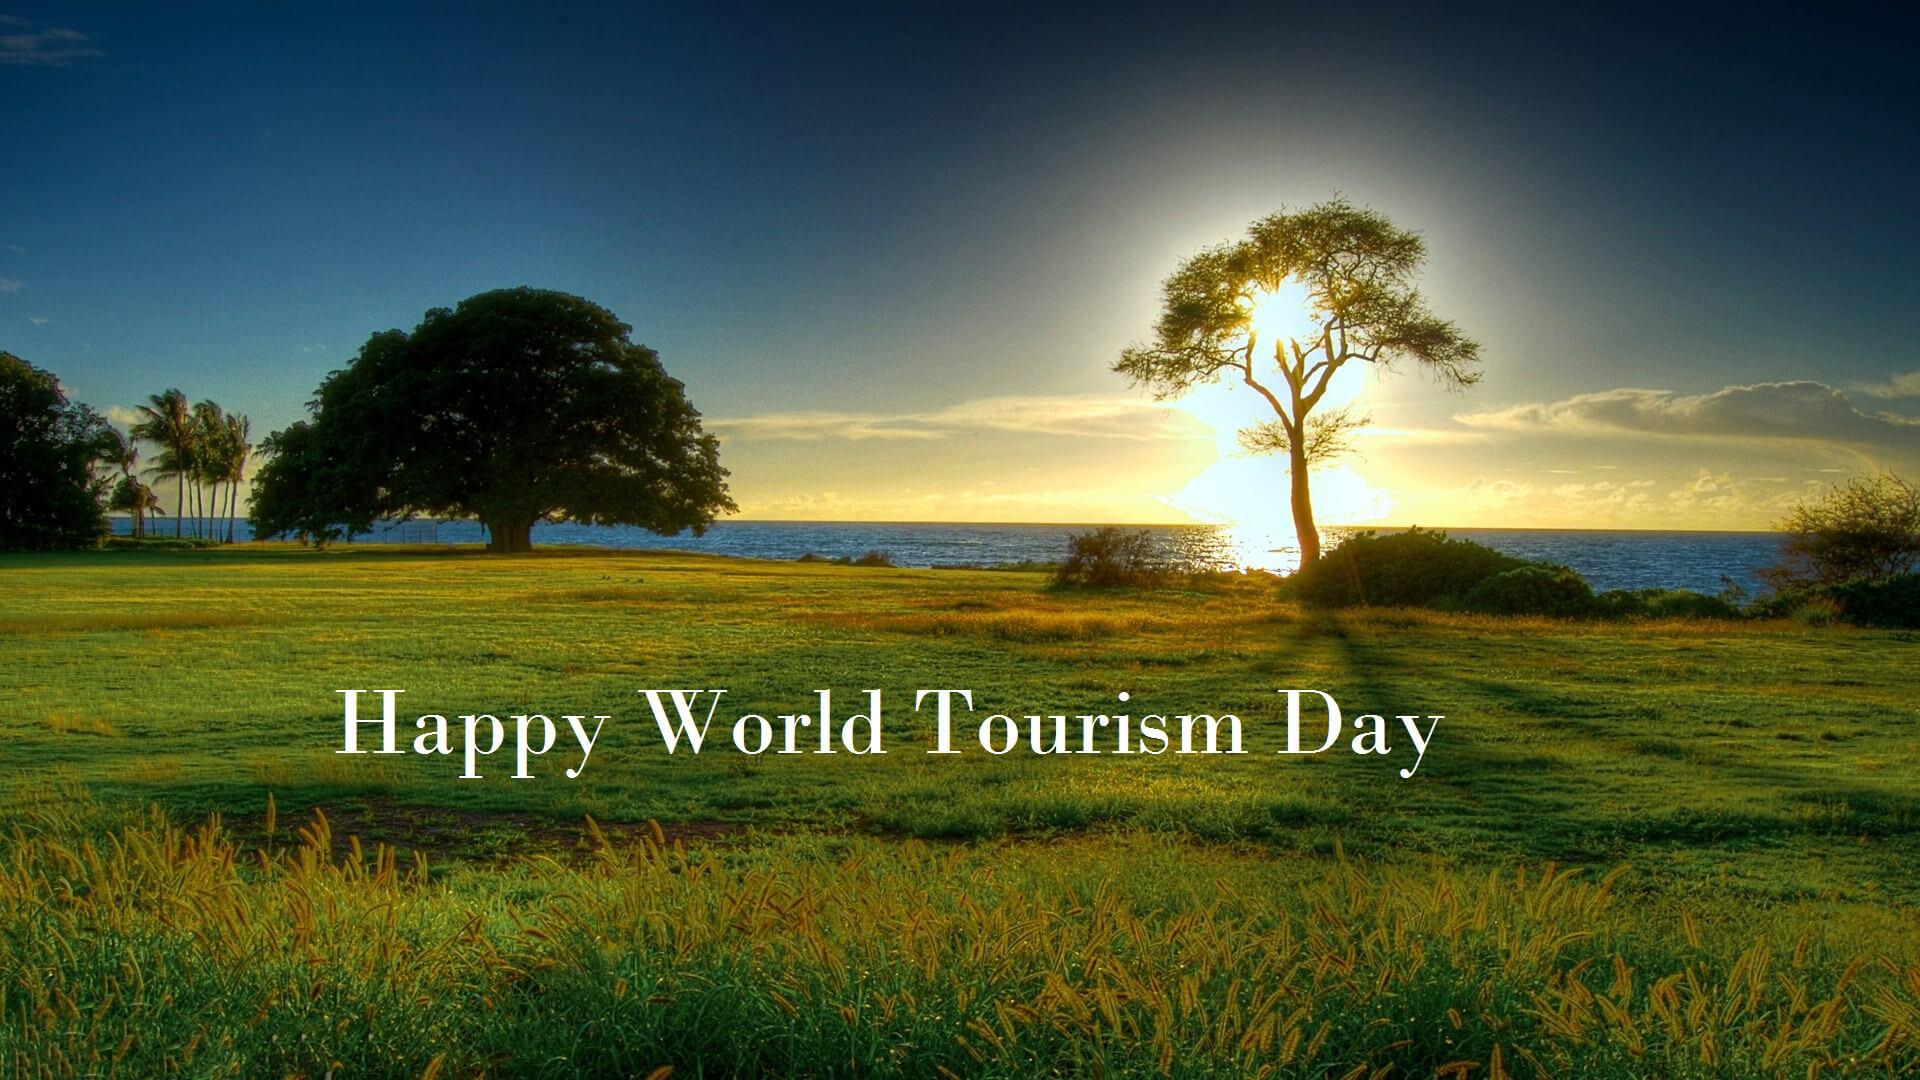 world tourism day 27th september wallpaper